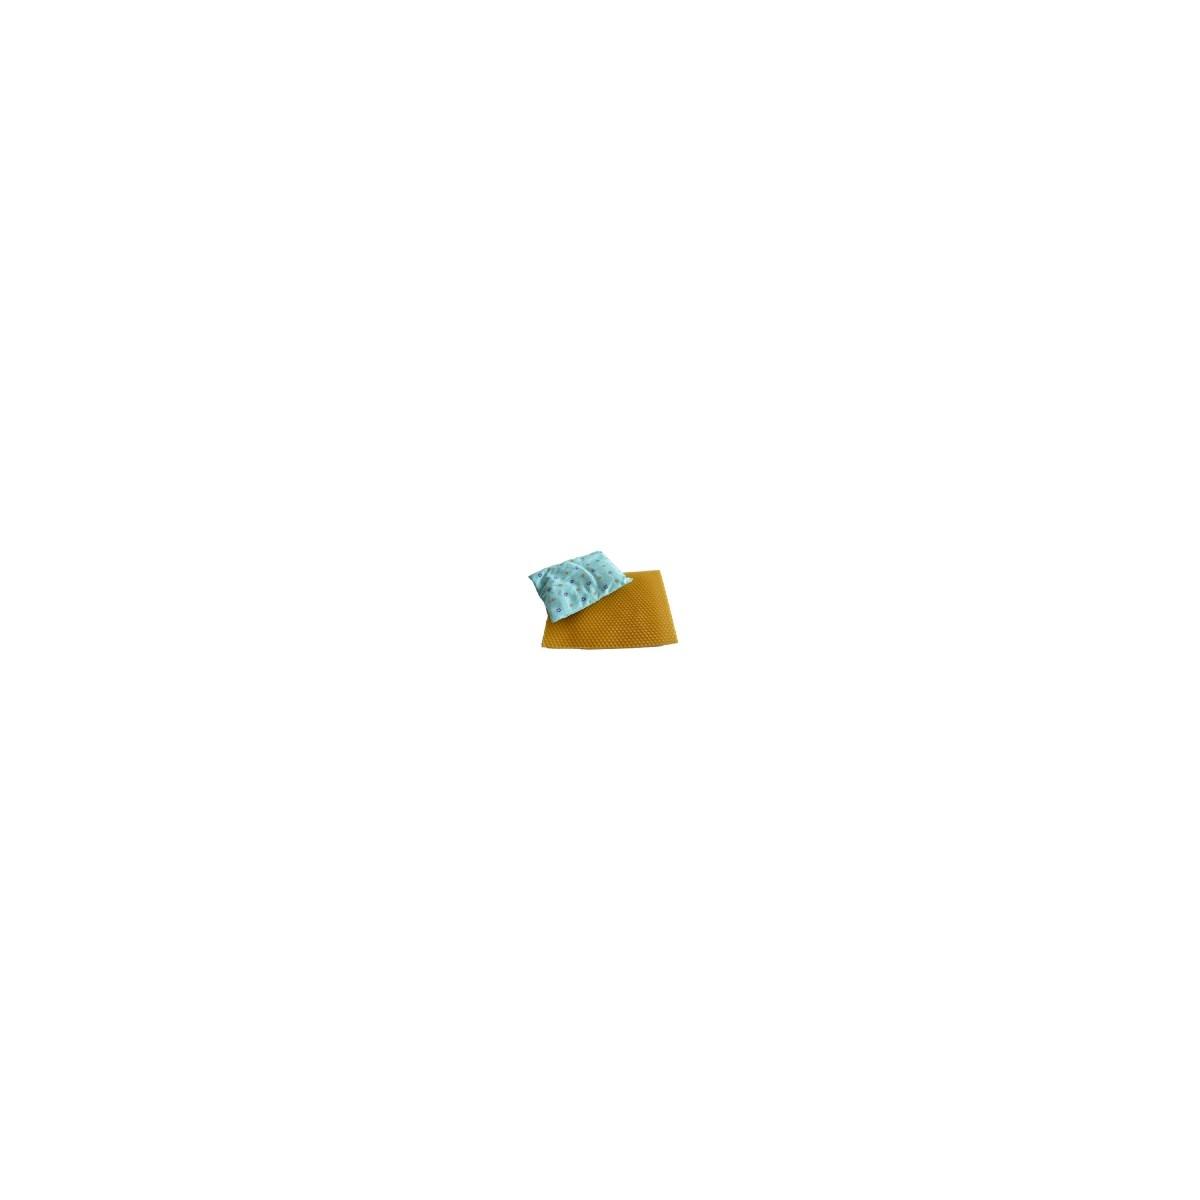 Set Bienenwachswickel